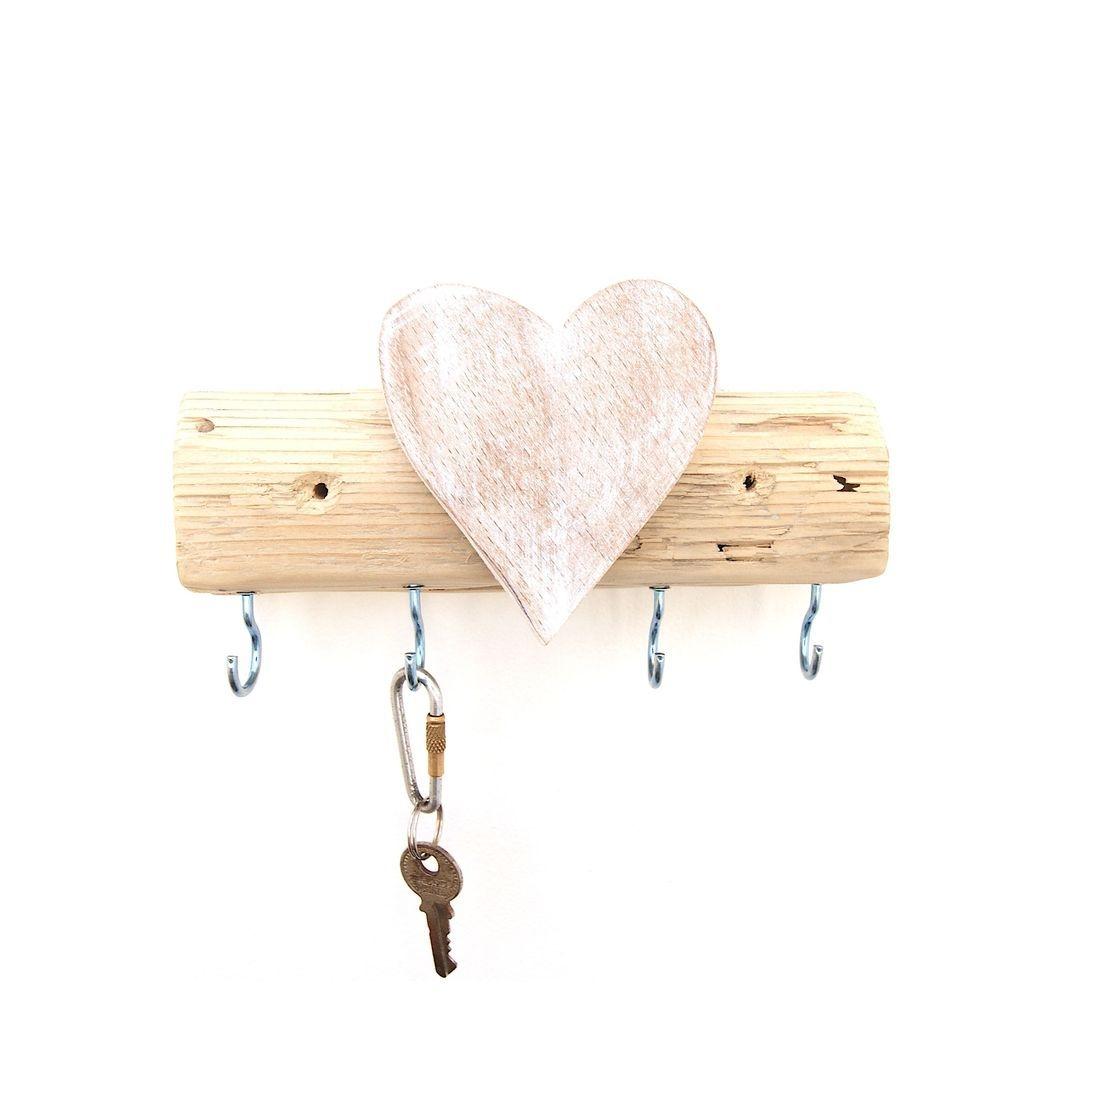 Driftwood Key holder 1